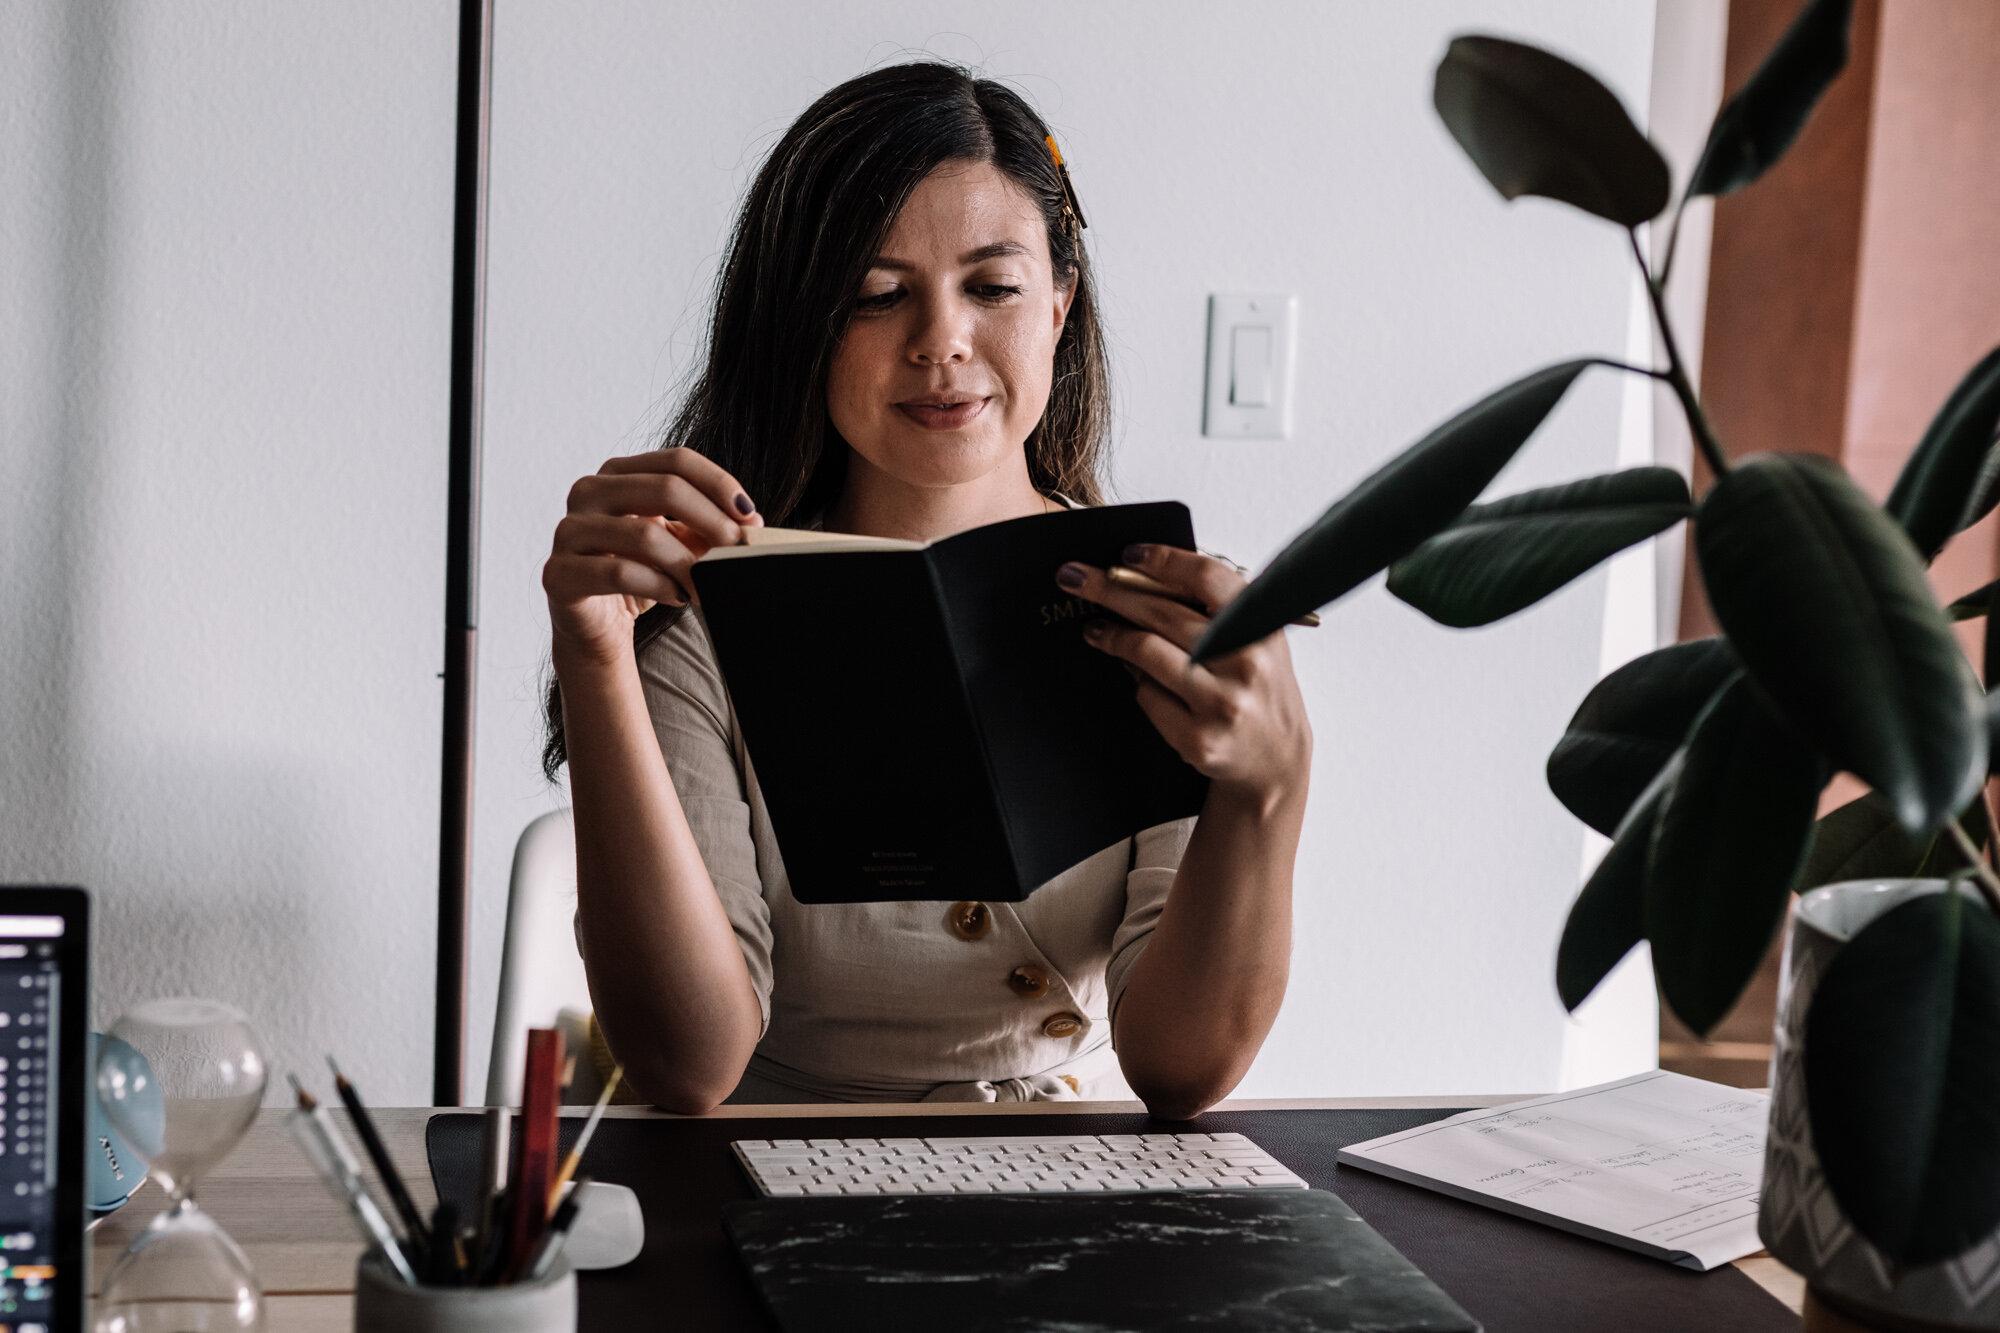 Rachel Off Duty: Rachel Reading Notes at Desk